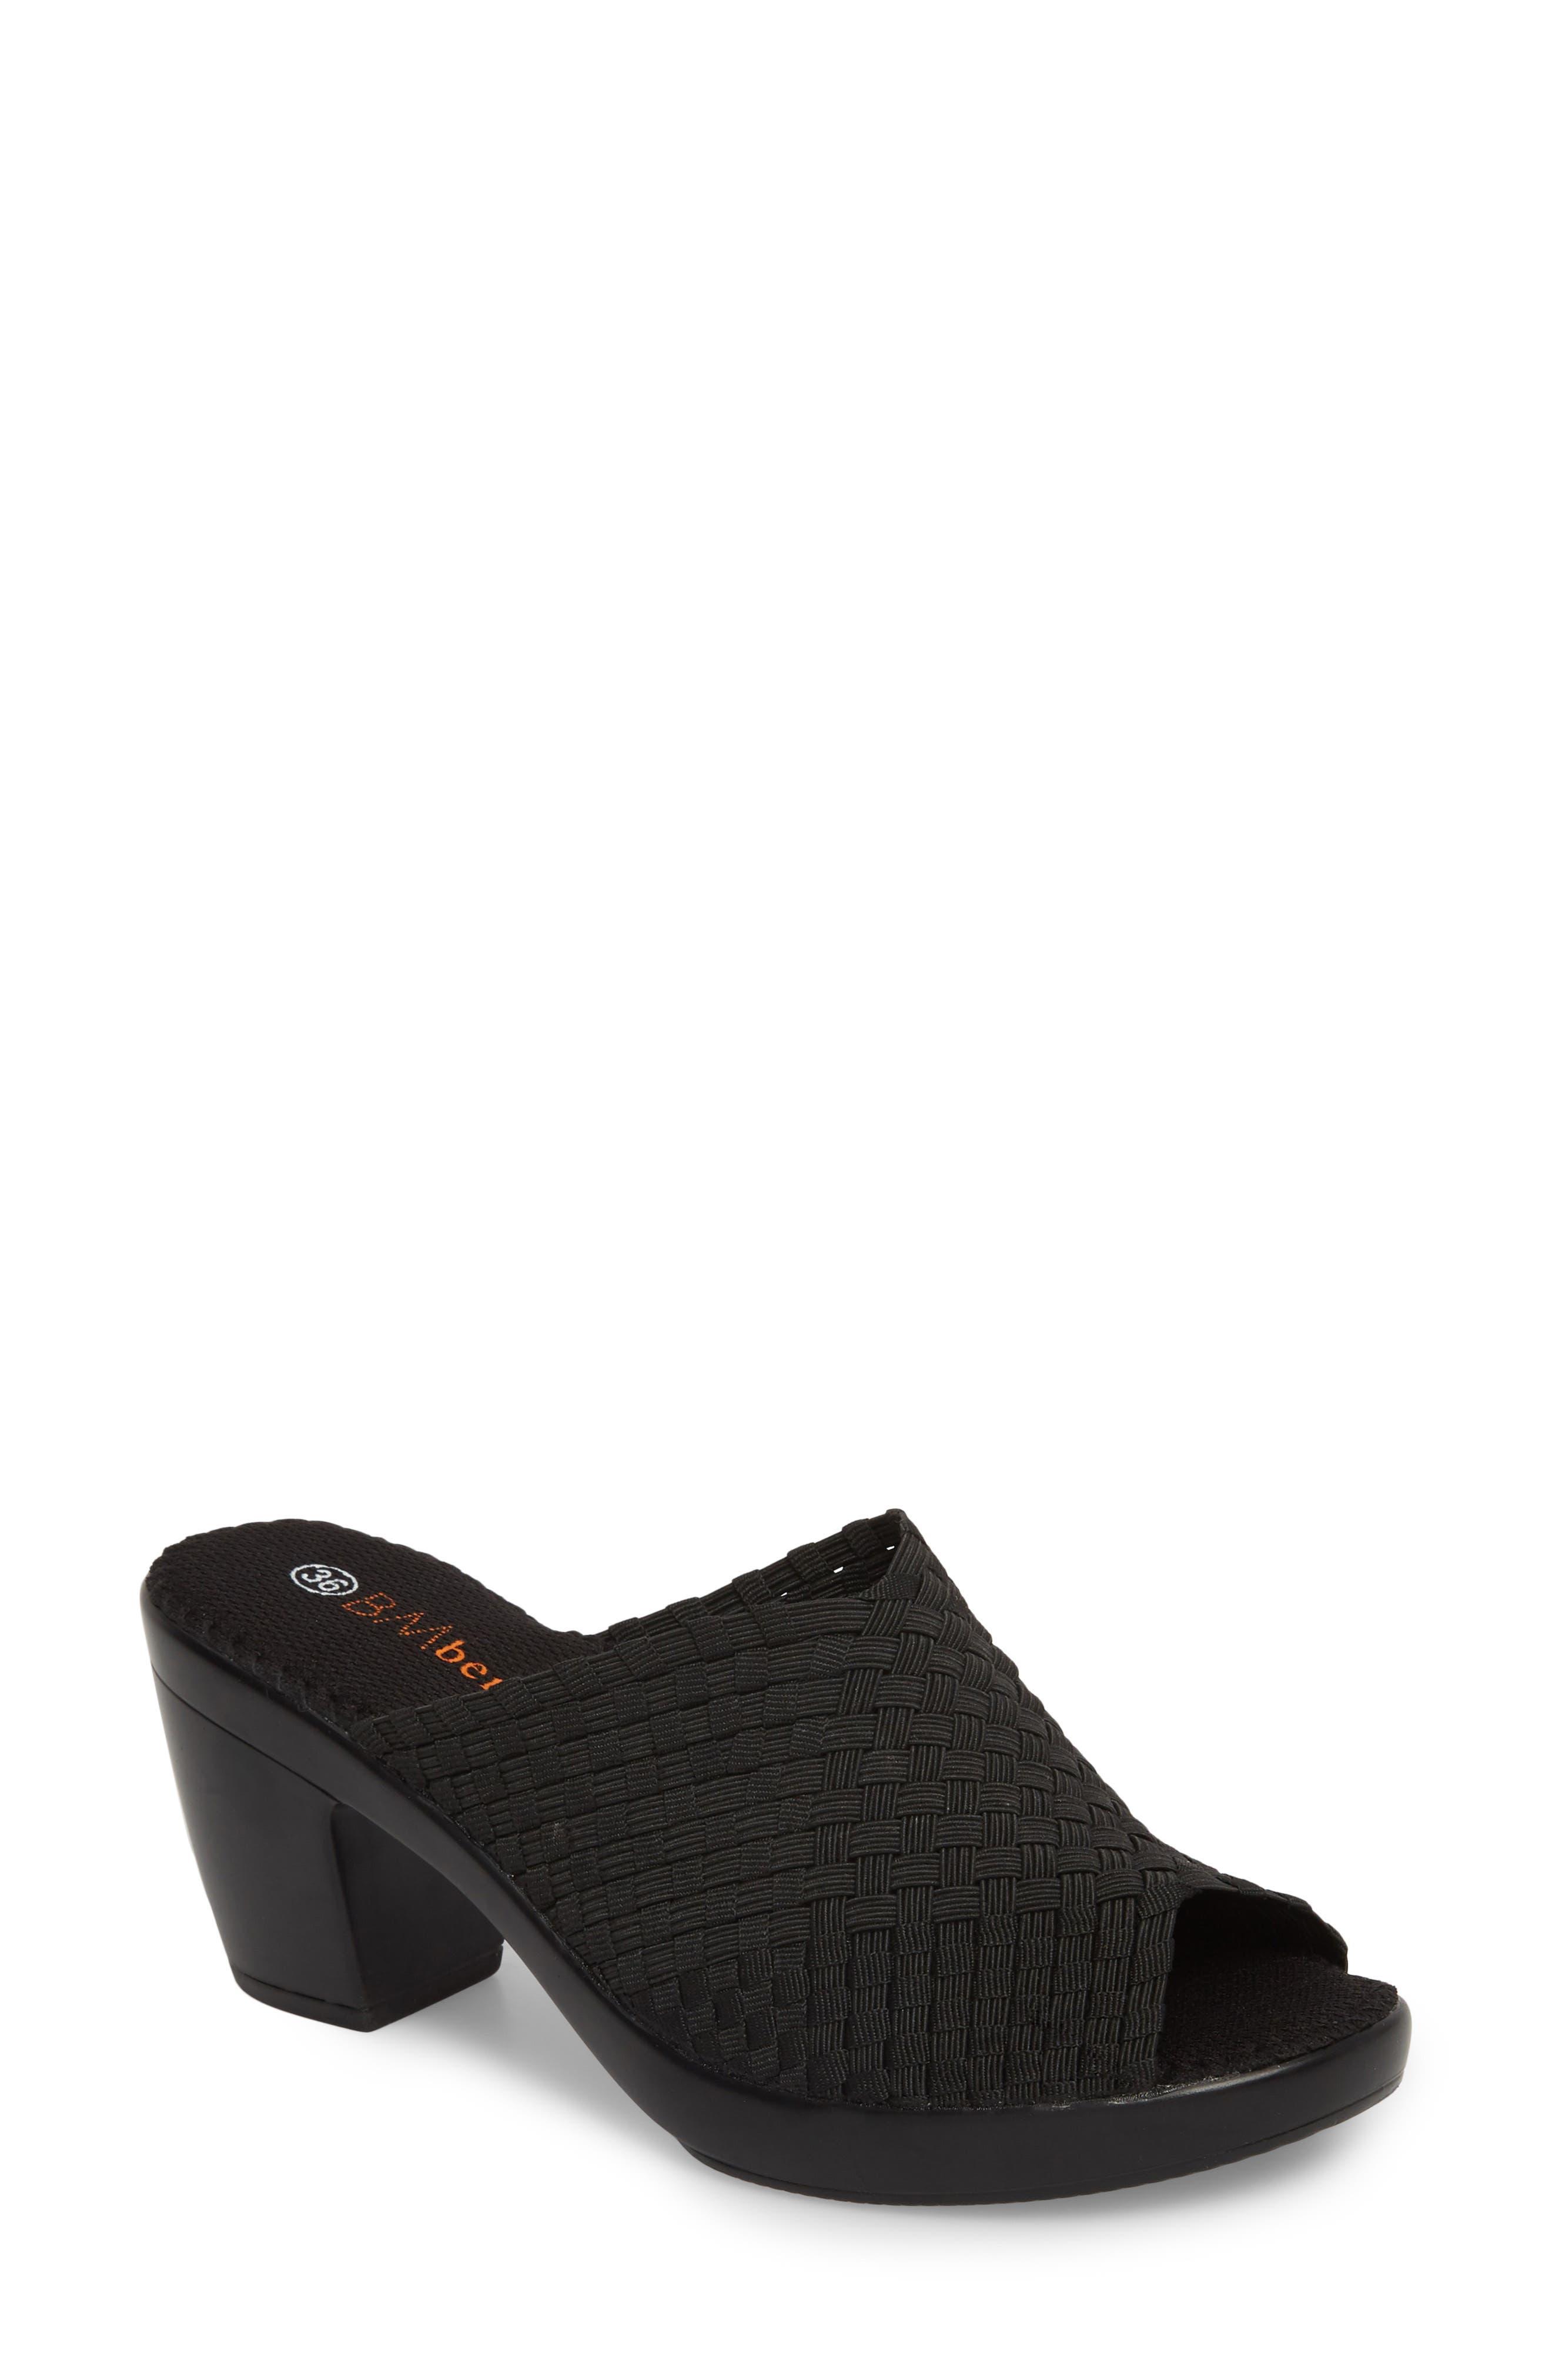 BERNIE MEV. Sun Texas Sandal, Main, color, BLACK FABRIC